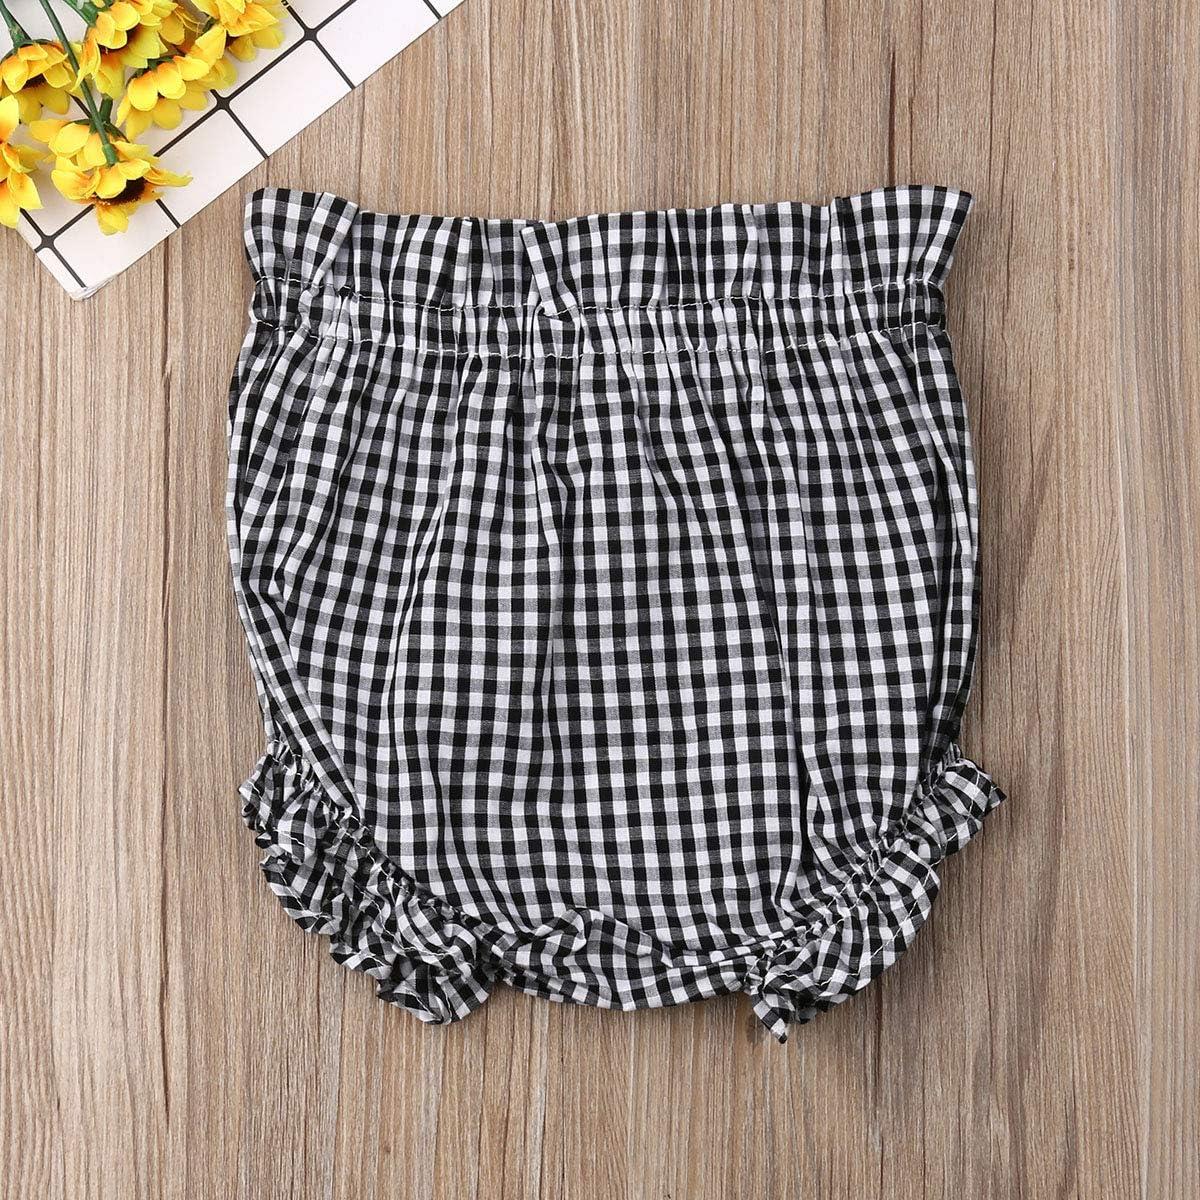 Karuedoo Baby Boys Girls Floral Print Ruffle Panty Diaper Covers Bloomer Shorts Loose Harem Shorts